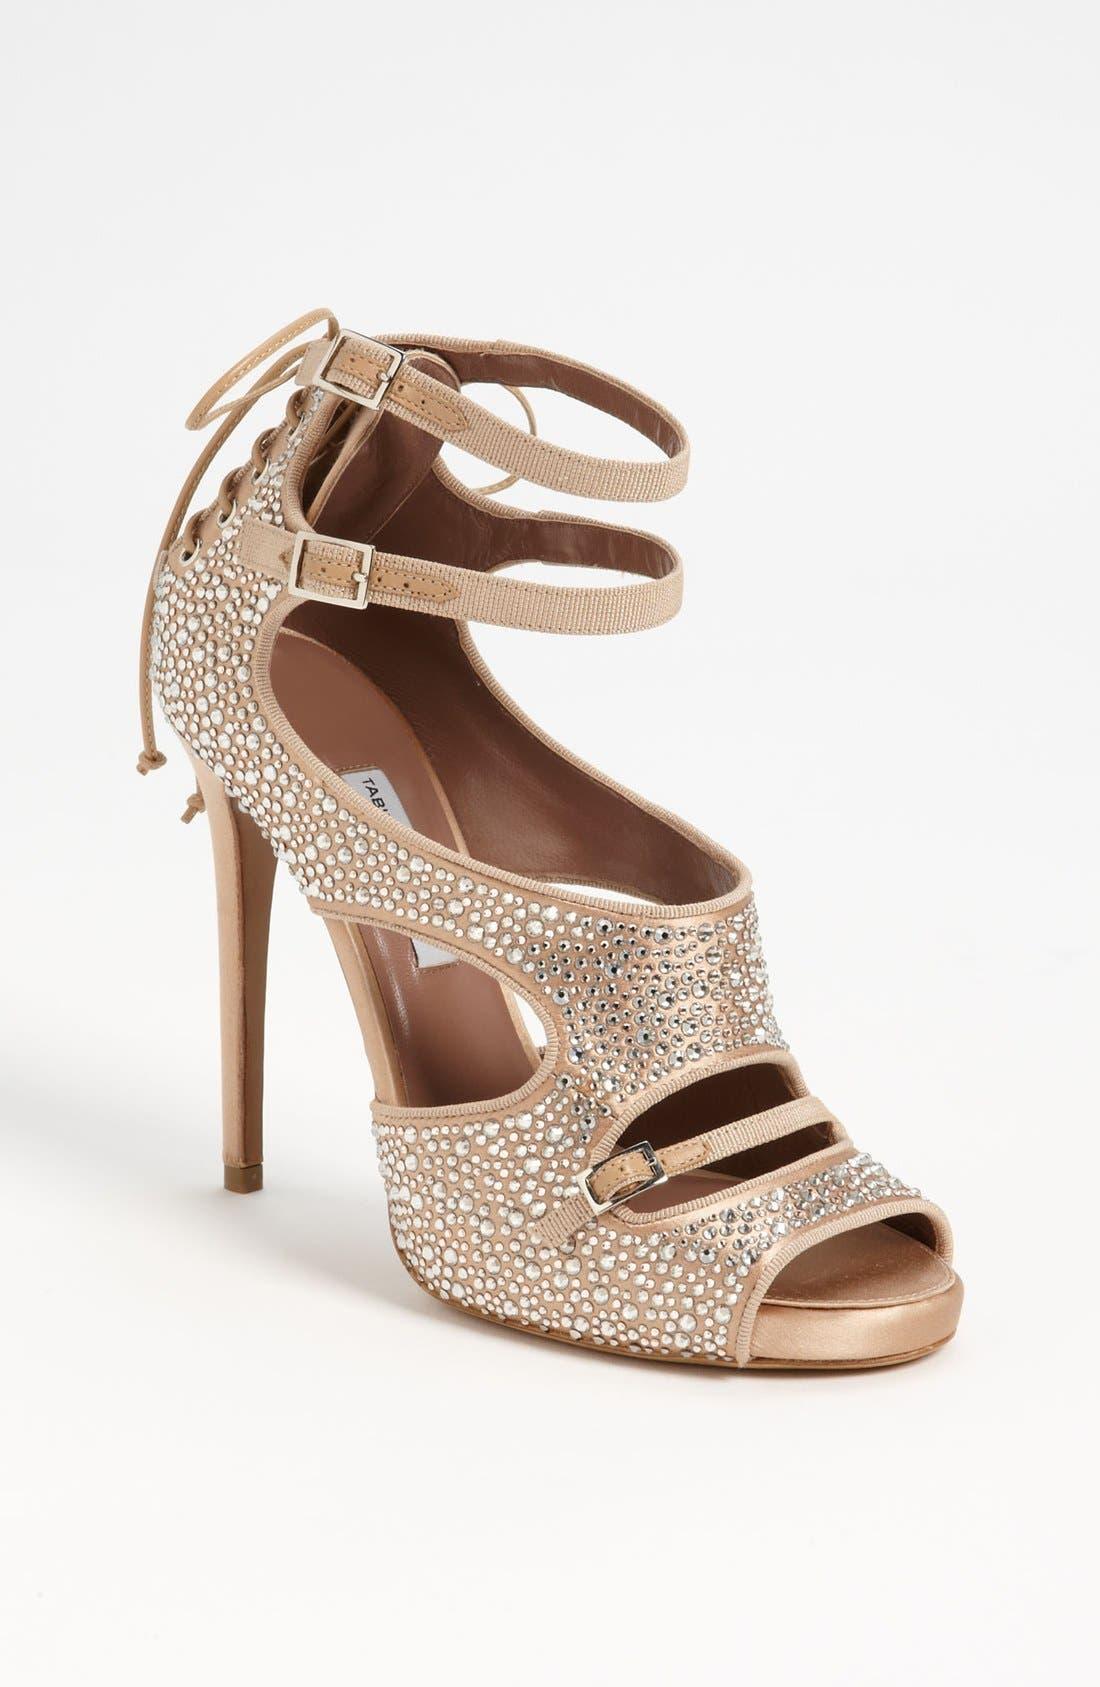 Main Image - Tabitha Simmons 'Bailey' Sandal